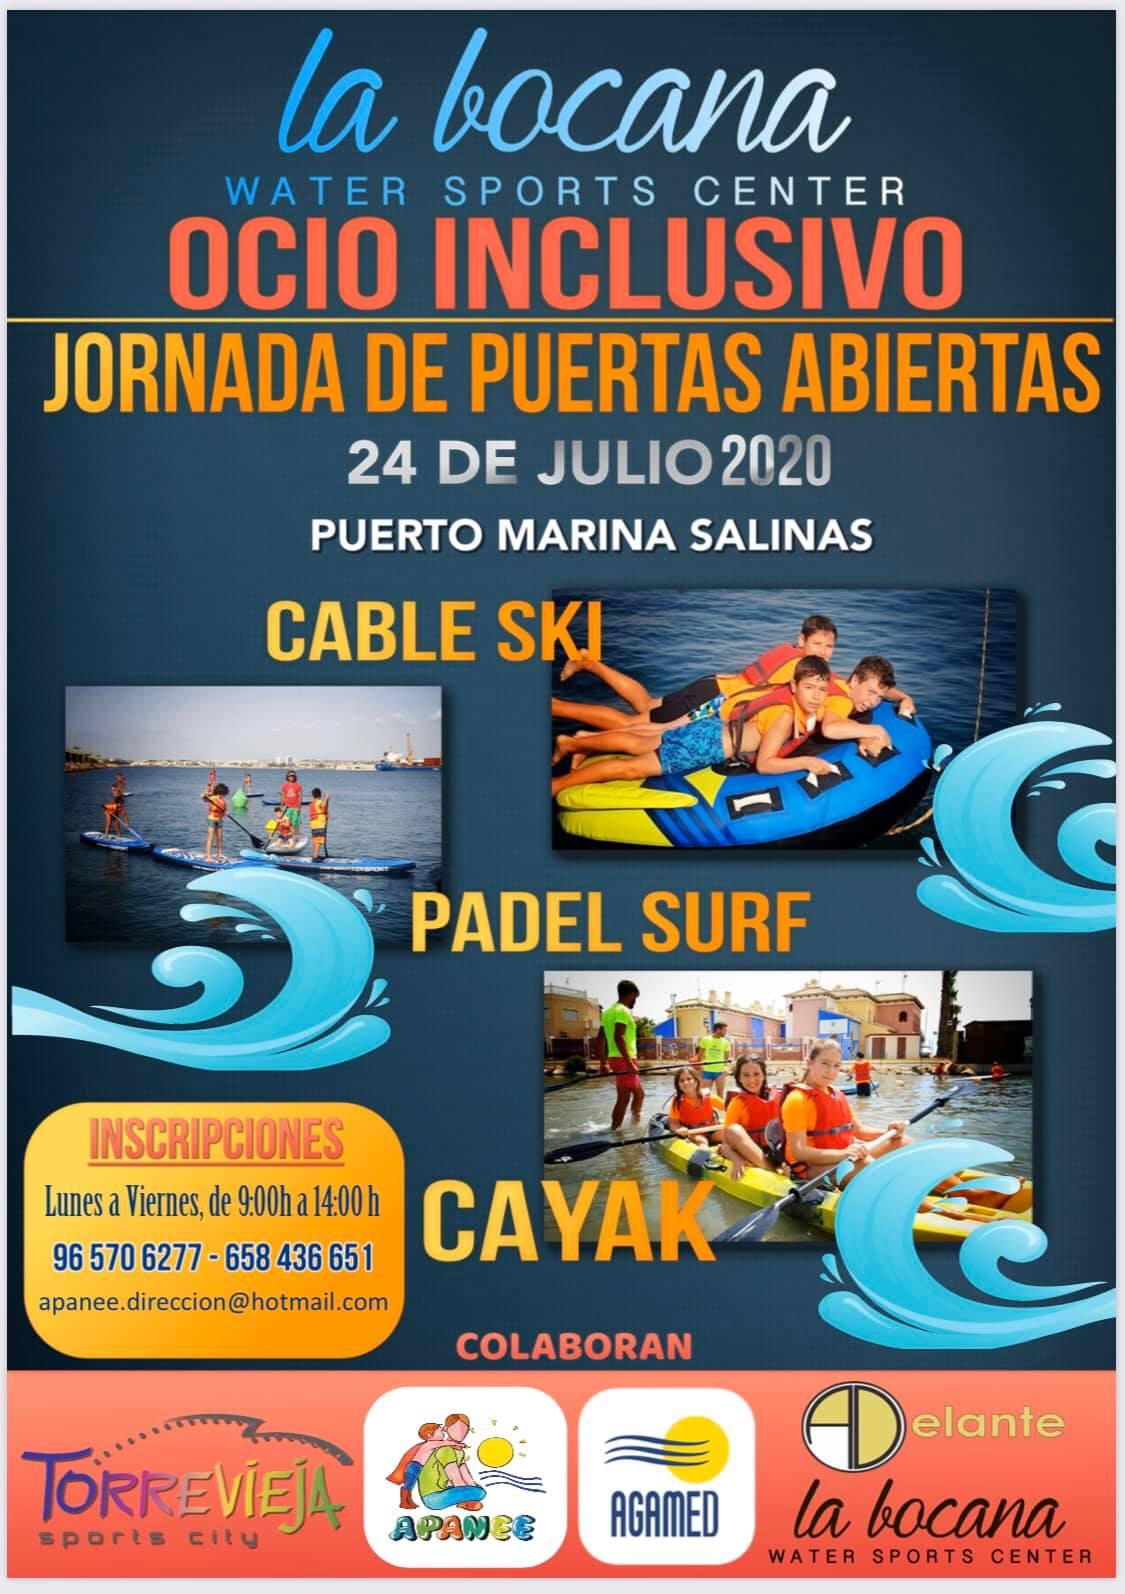 (Español) 🏄♂️Jornada deportiva inclusiva en la Bocana Water Sport Center.☀️